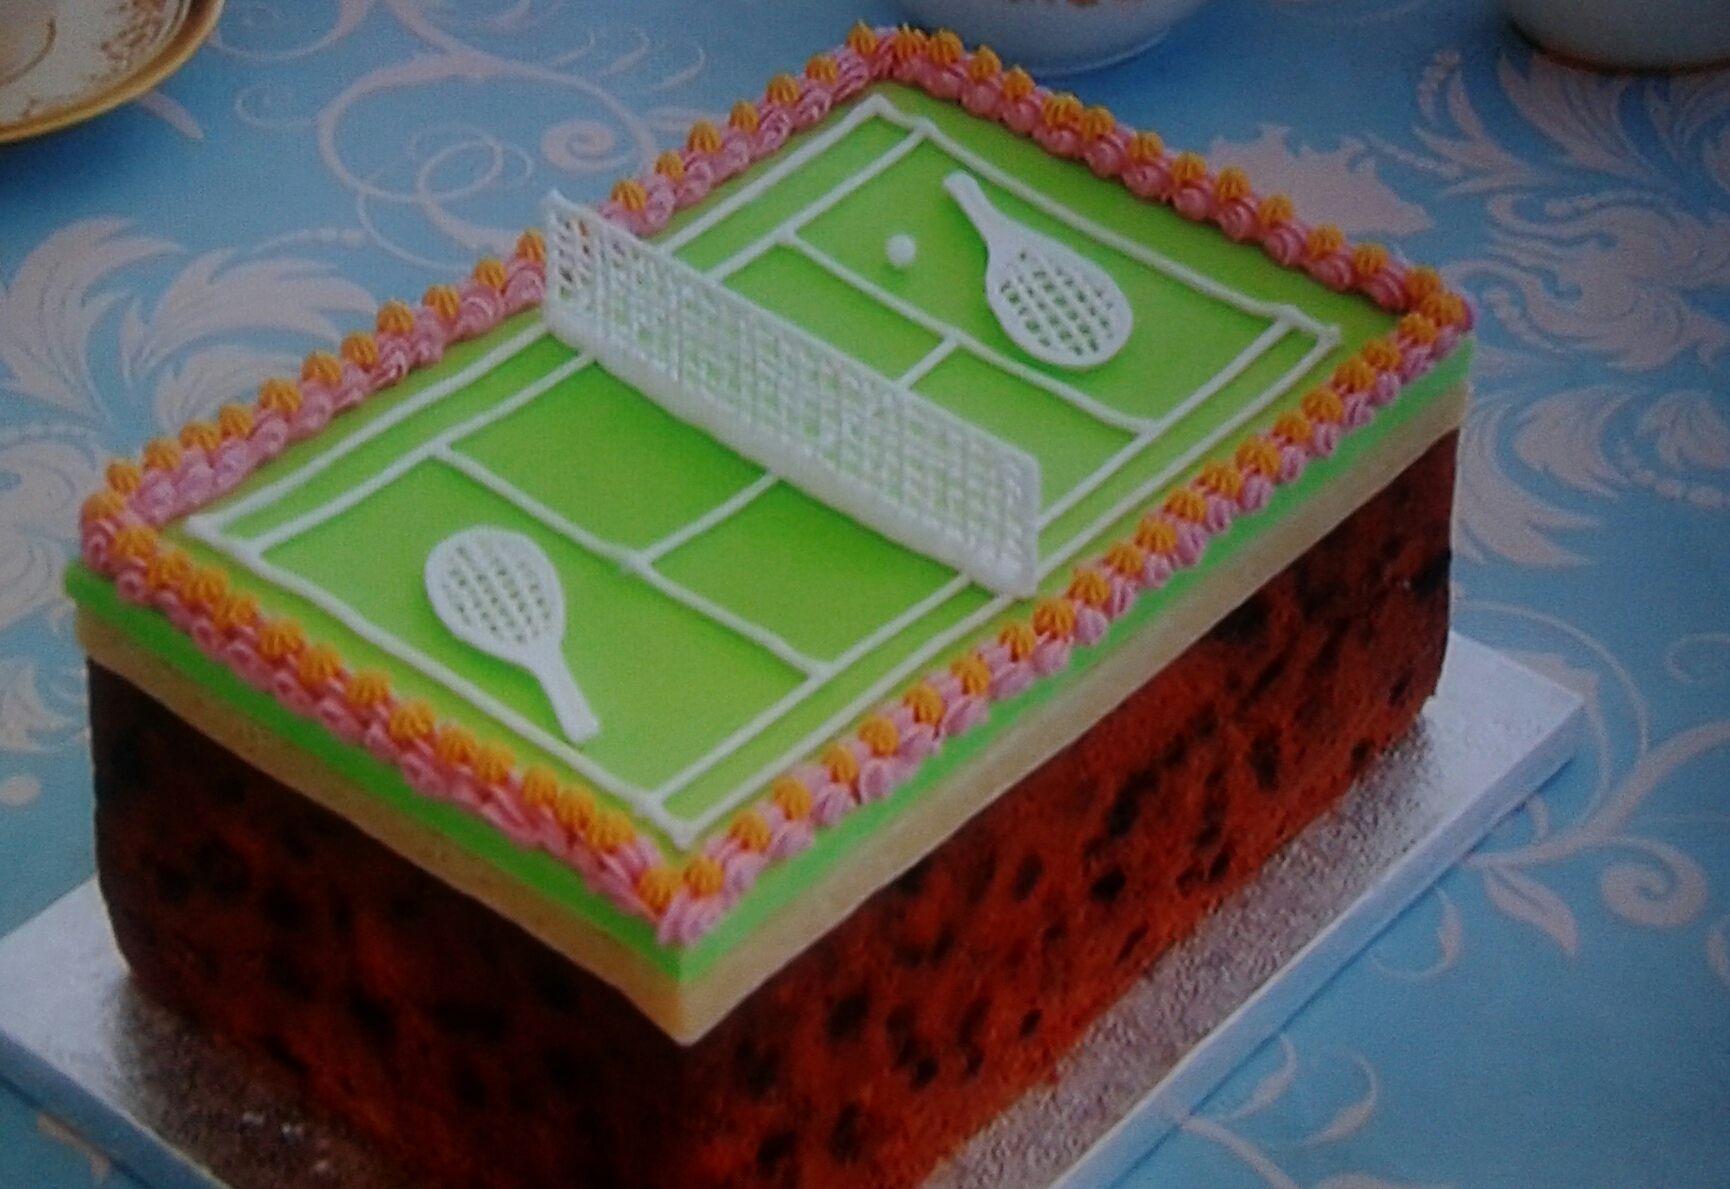 Tennis Cake: The Great British Bake Off 2015